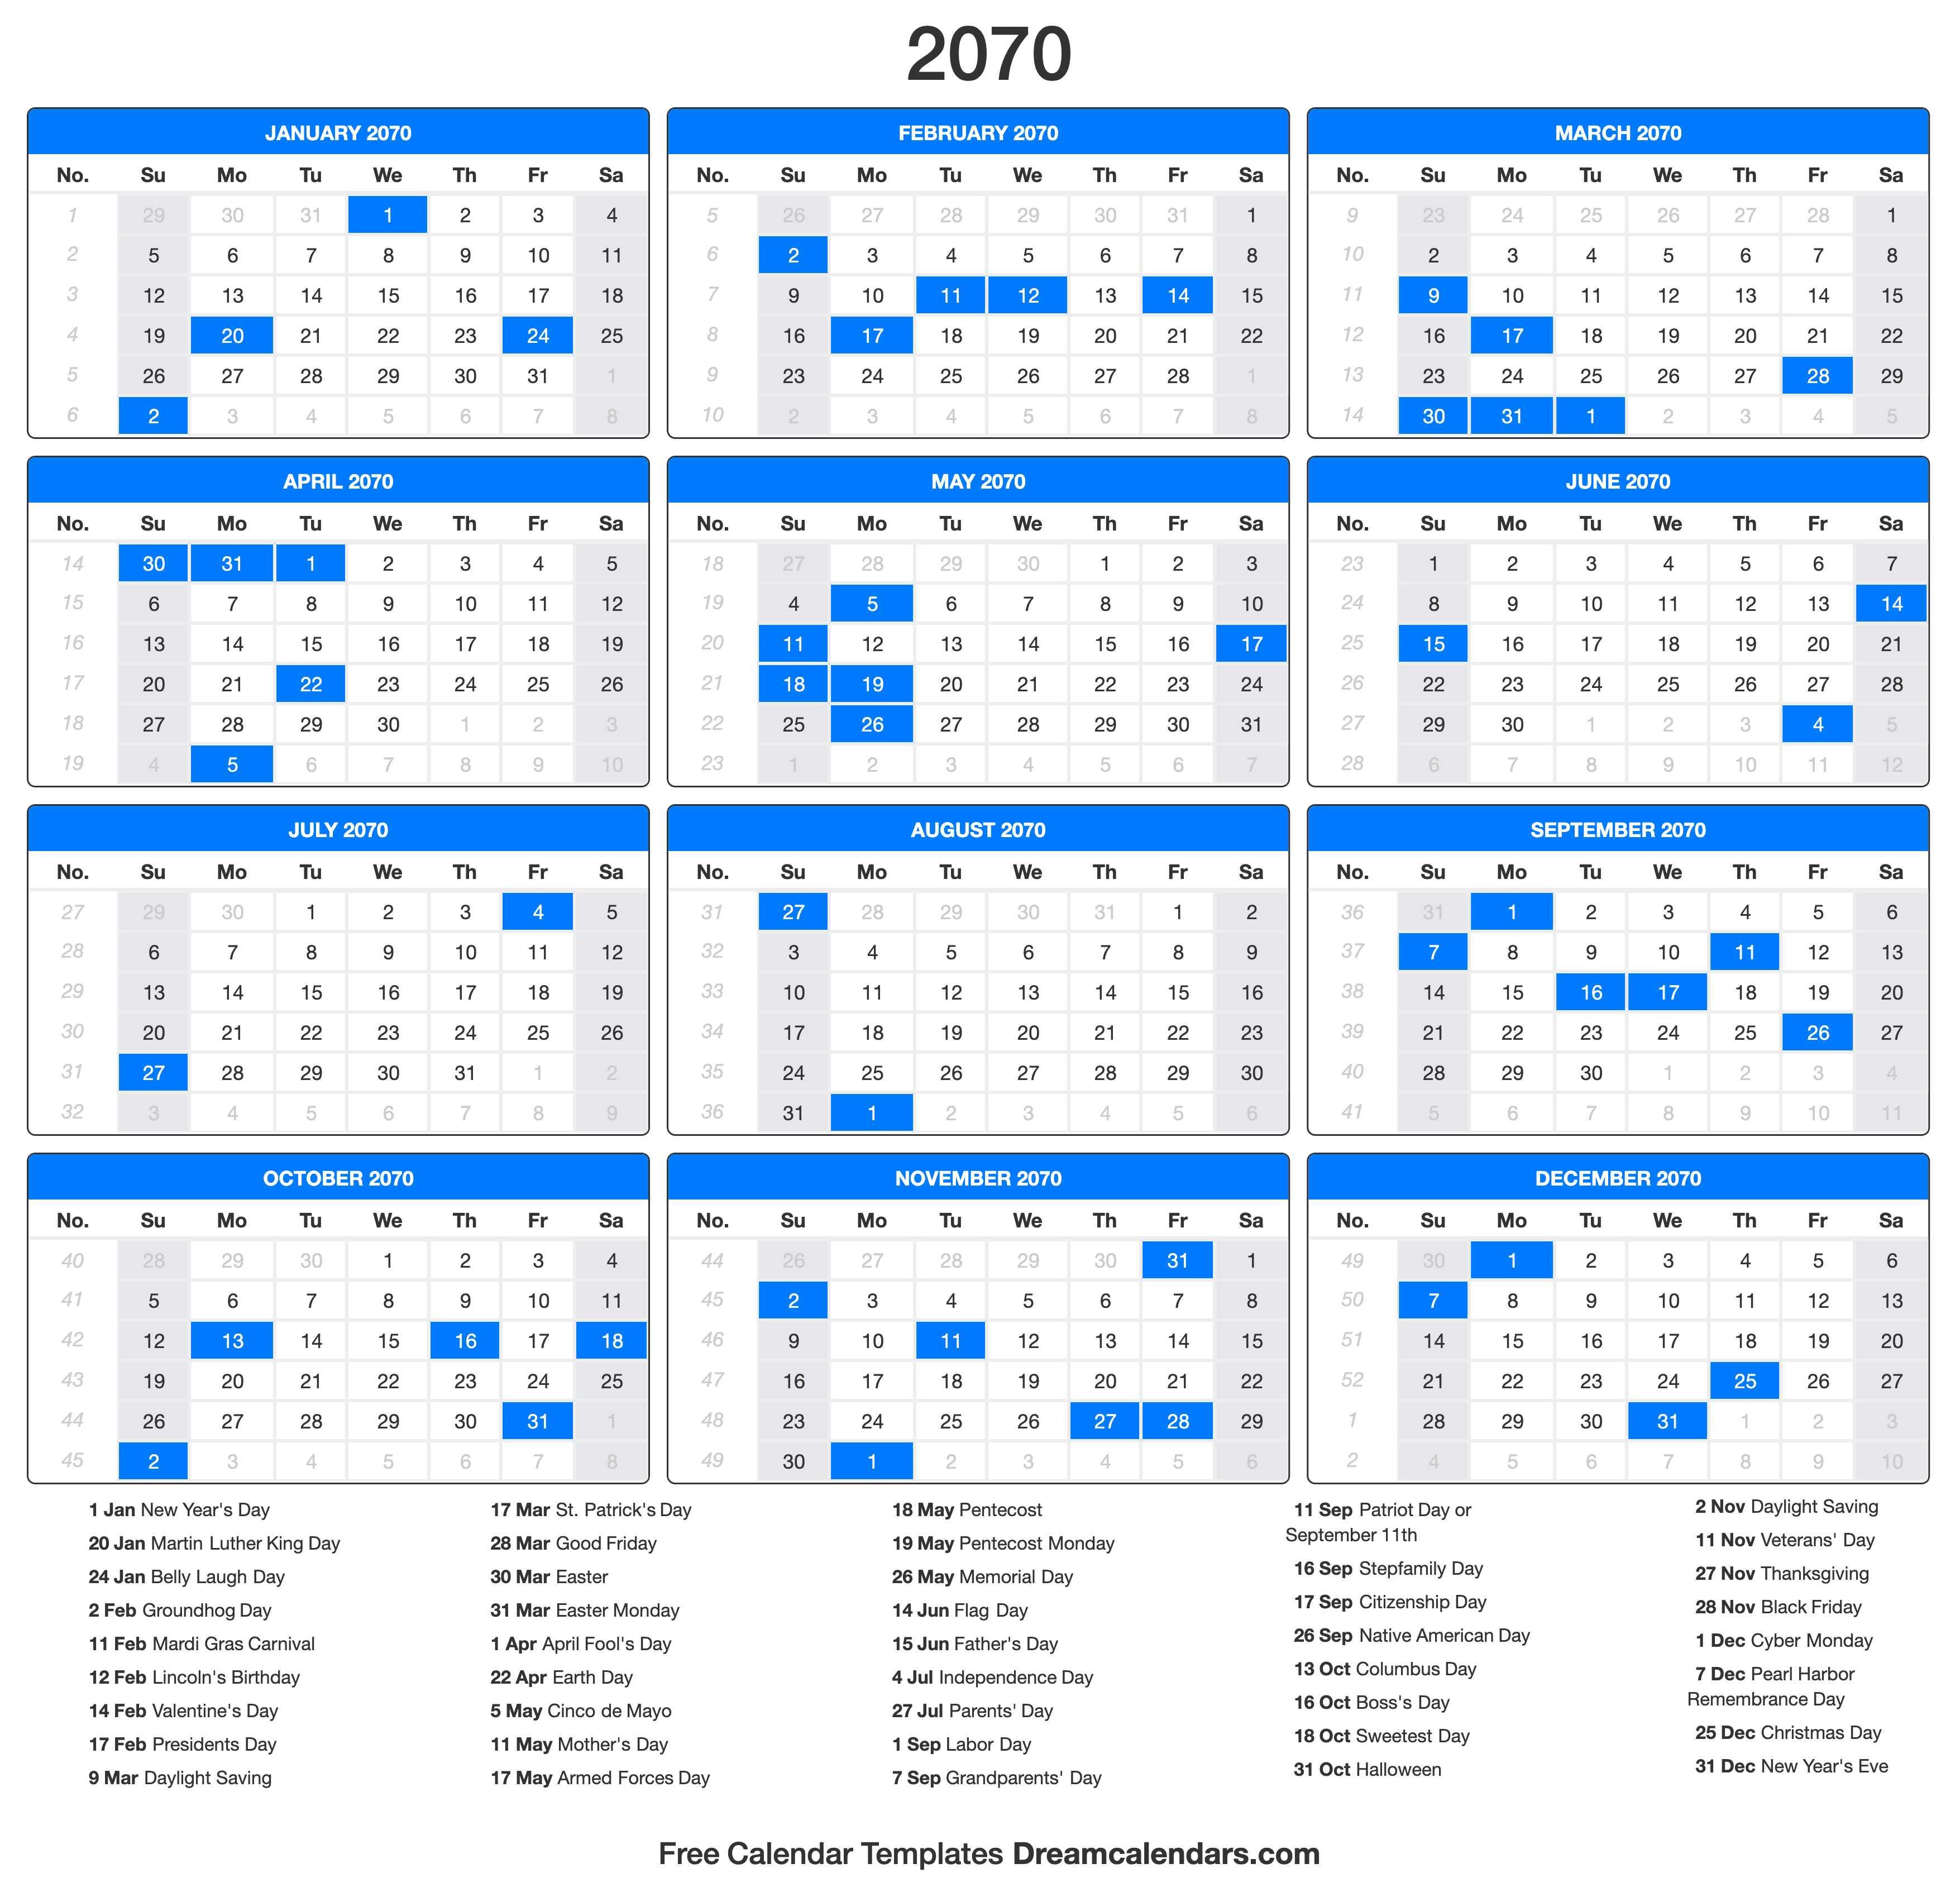 Lunar Calendar October 2022.2070 Calendar